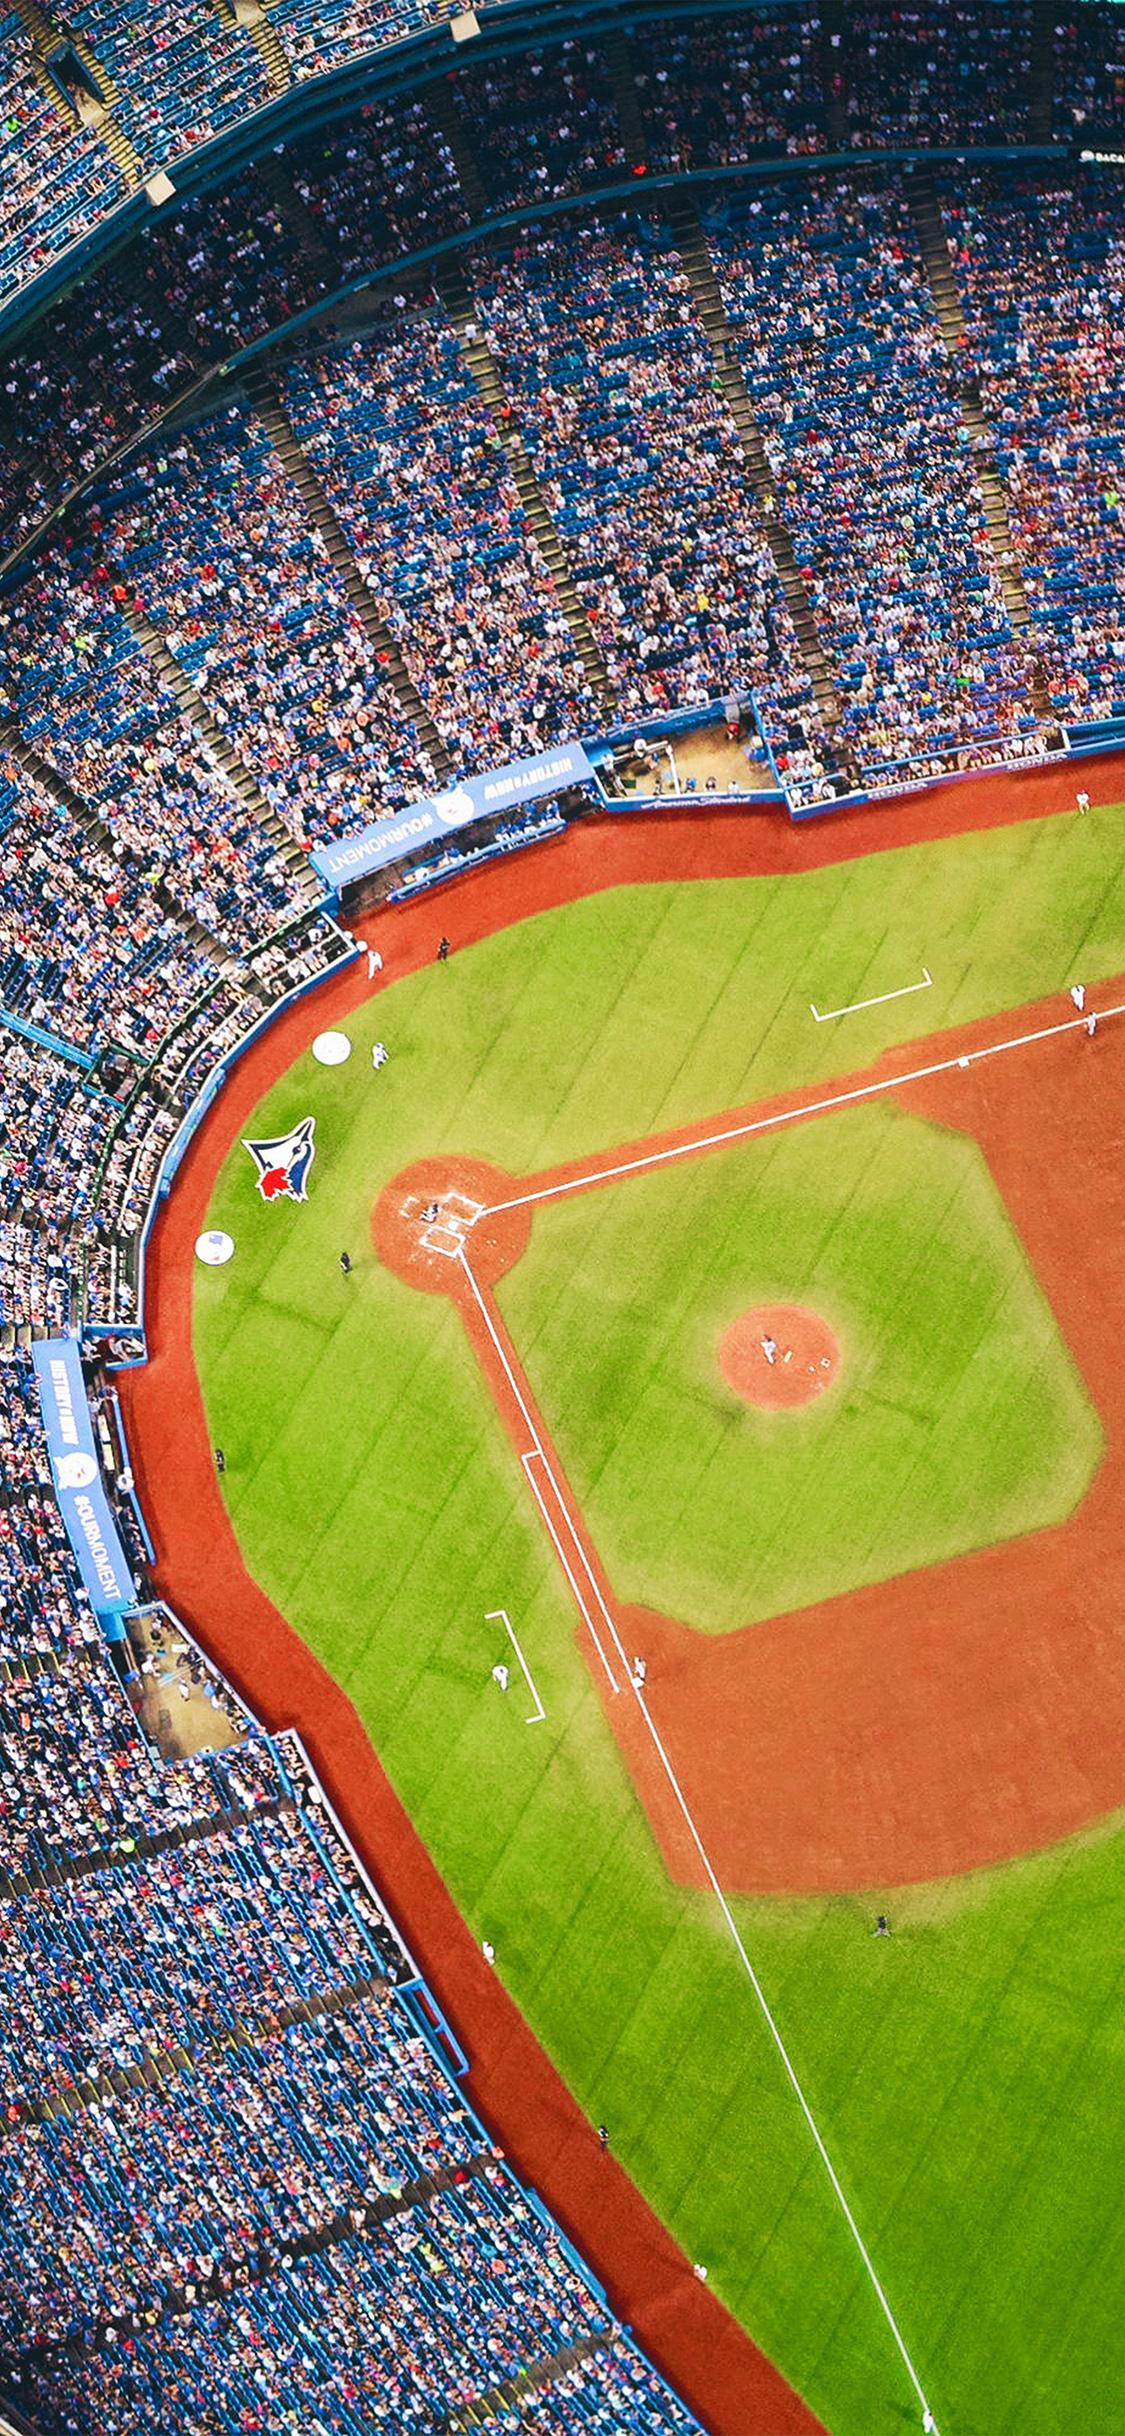 Mlb Iphone Wallpaper Nh26 Bluejays Baseball Mlb Field Sports Wallpaper